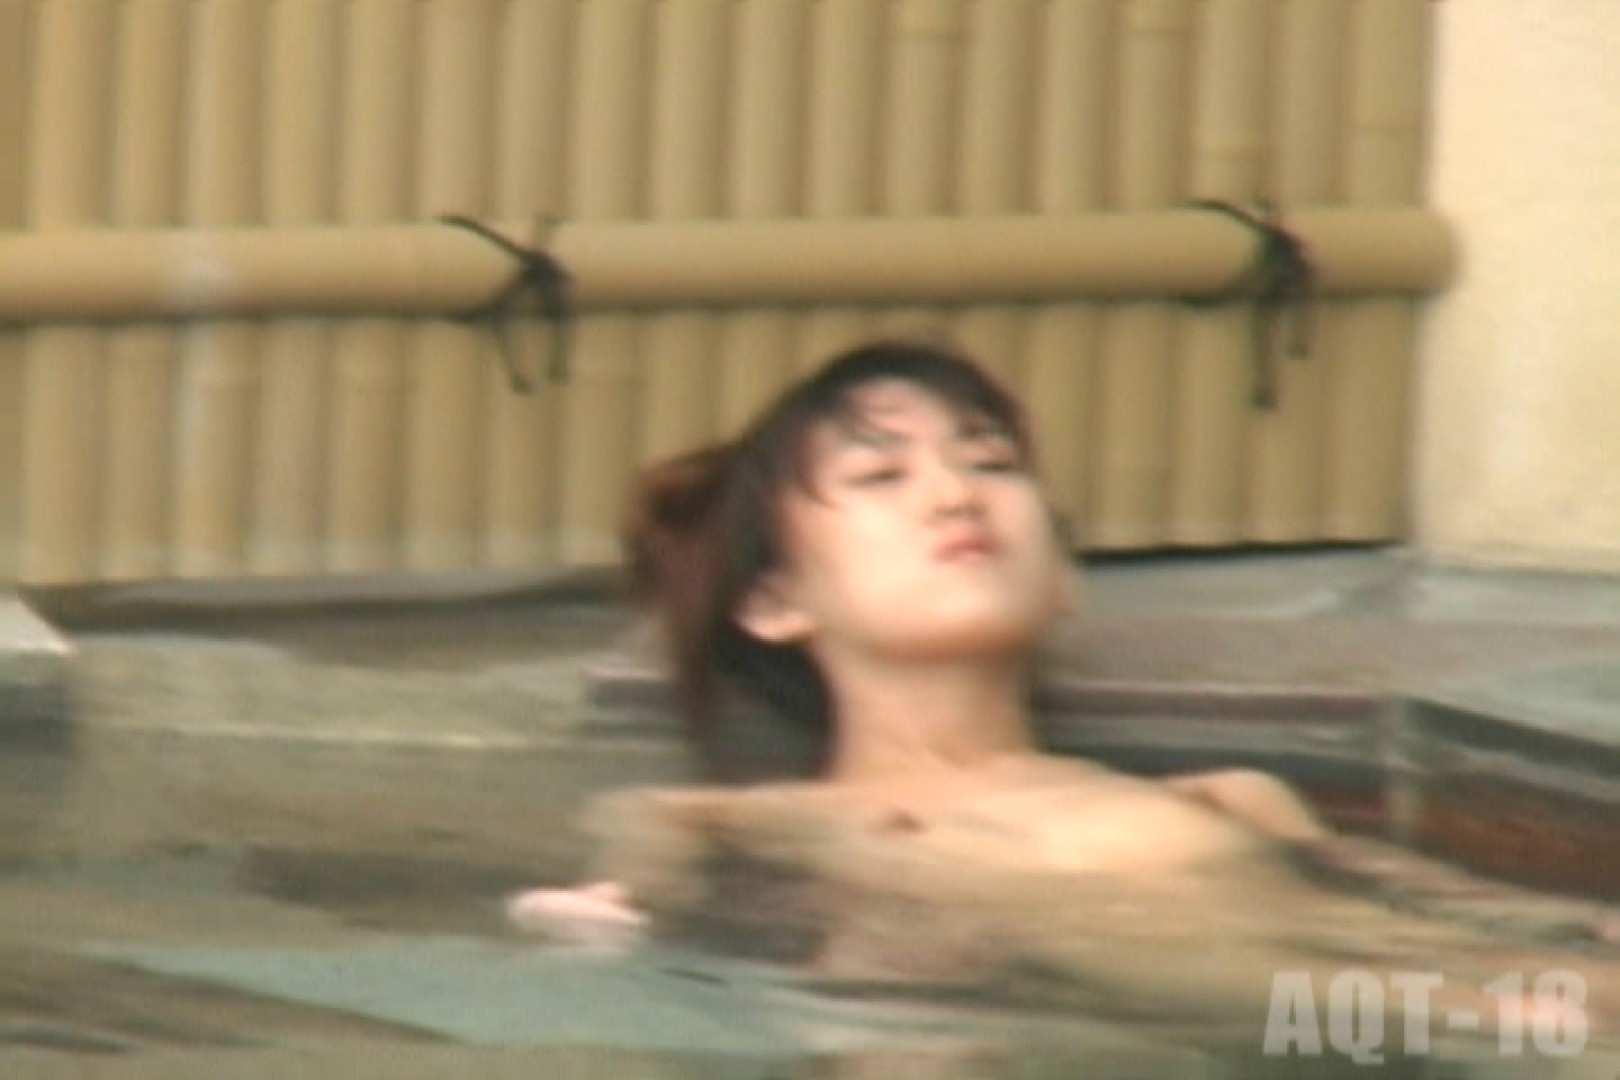 Aquaな露天風呂Vol.862 盗撮師作品  99pic 3